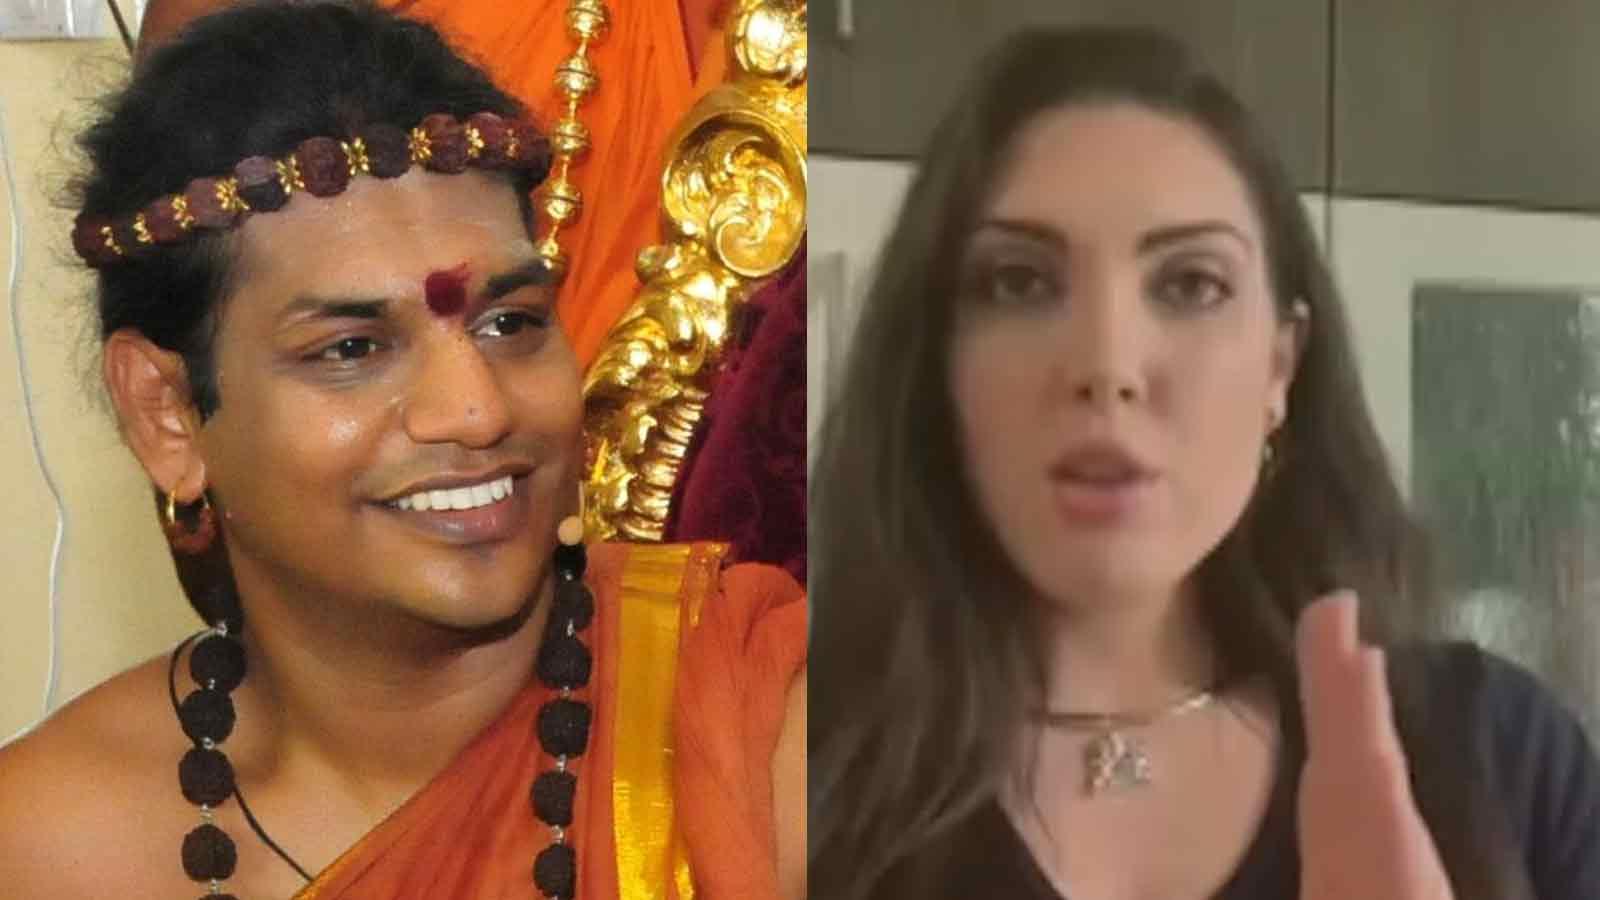 i-was-brainwashed-by-swami-nithyananda-reveals-follower